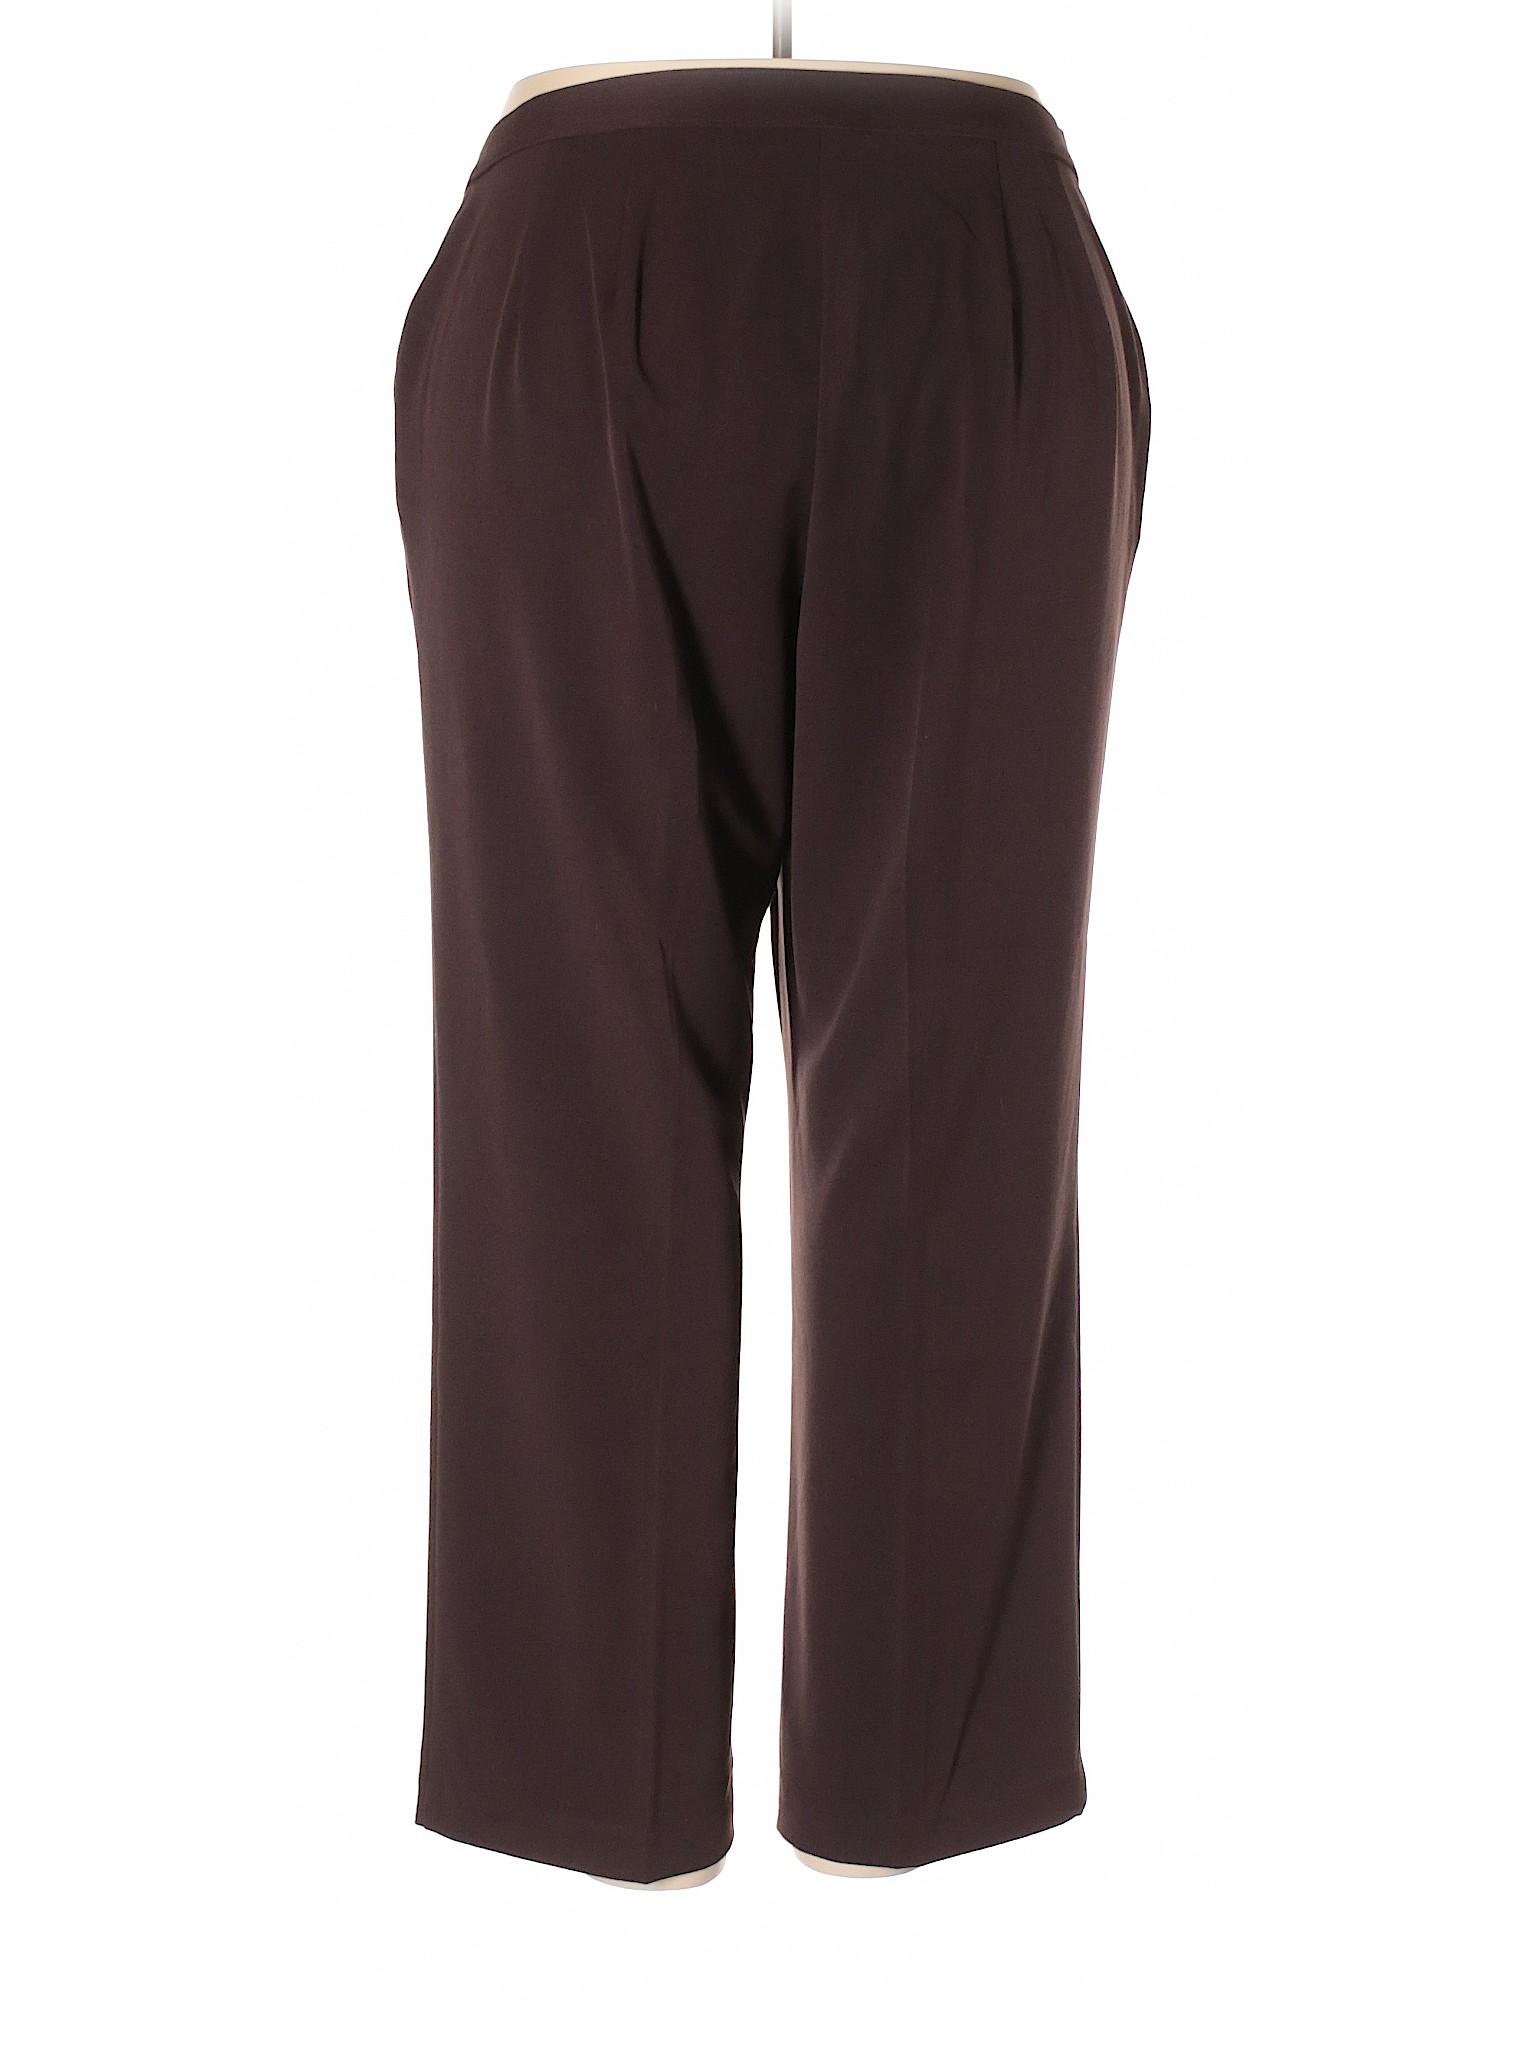 Dress Investments winter Pants II Leisure qtOz5Fwz